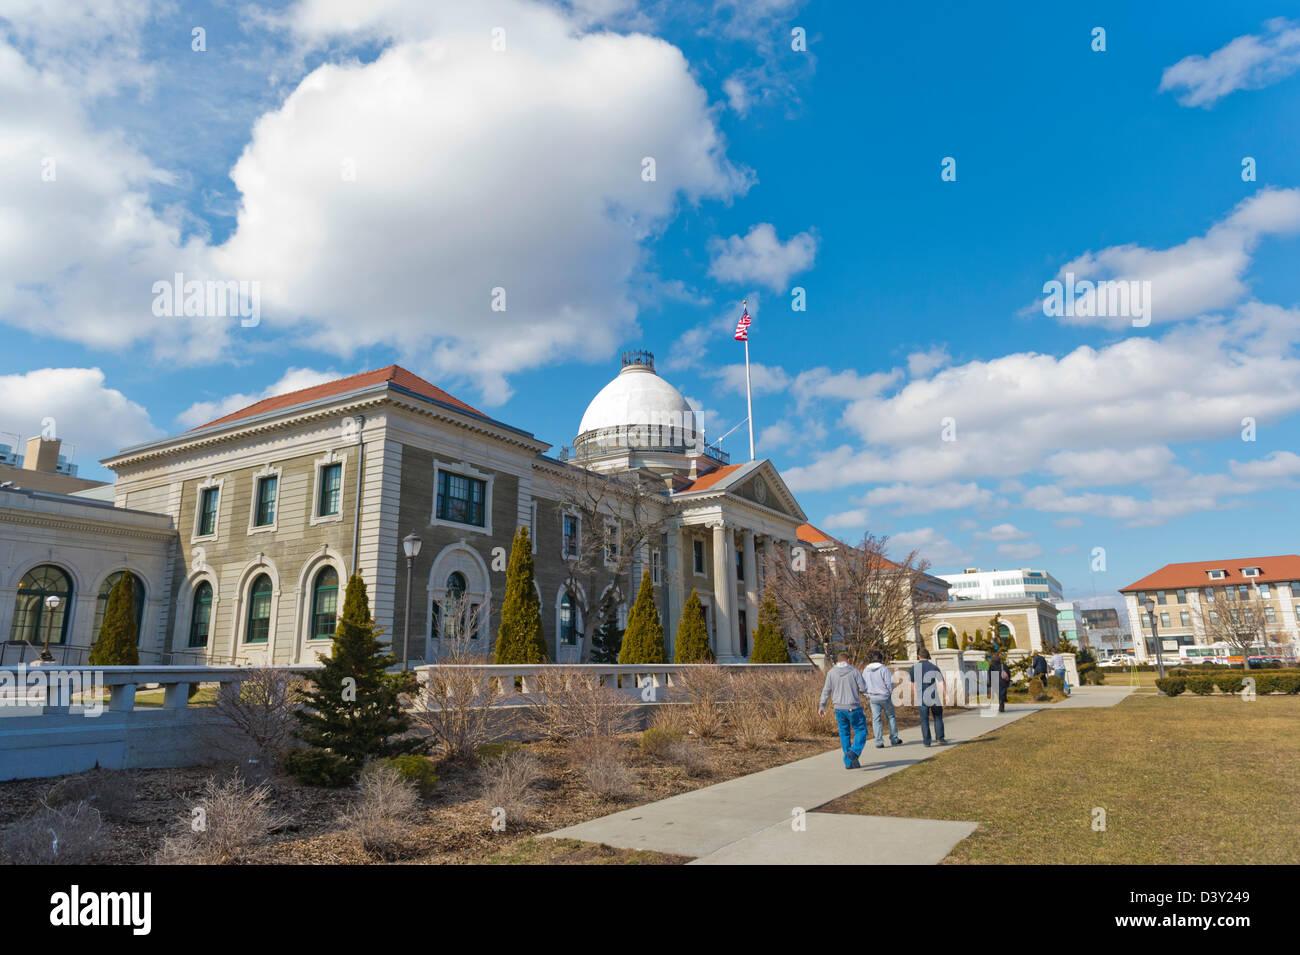 Feb. 25, 2013 - Mineola, New York, U.S. - Nassau County Legislature postpones vote on controversial Redistricting - Stock Image